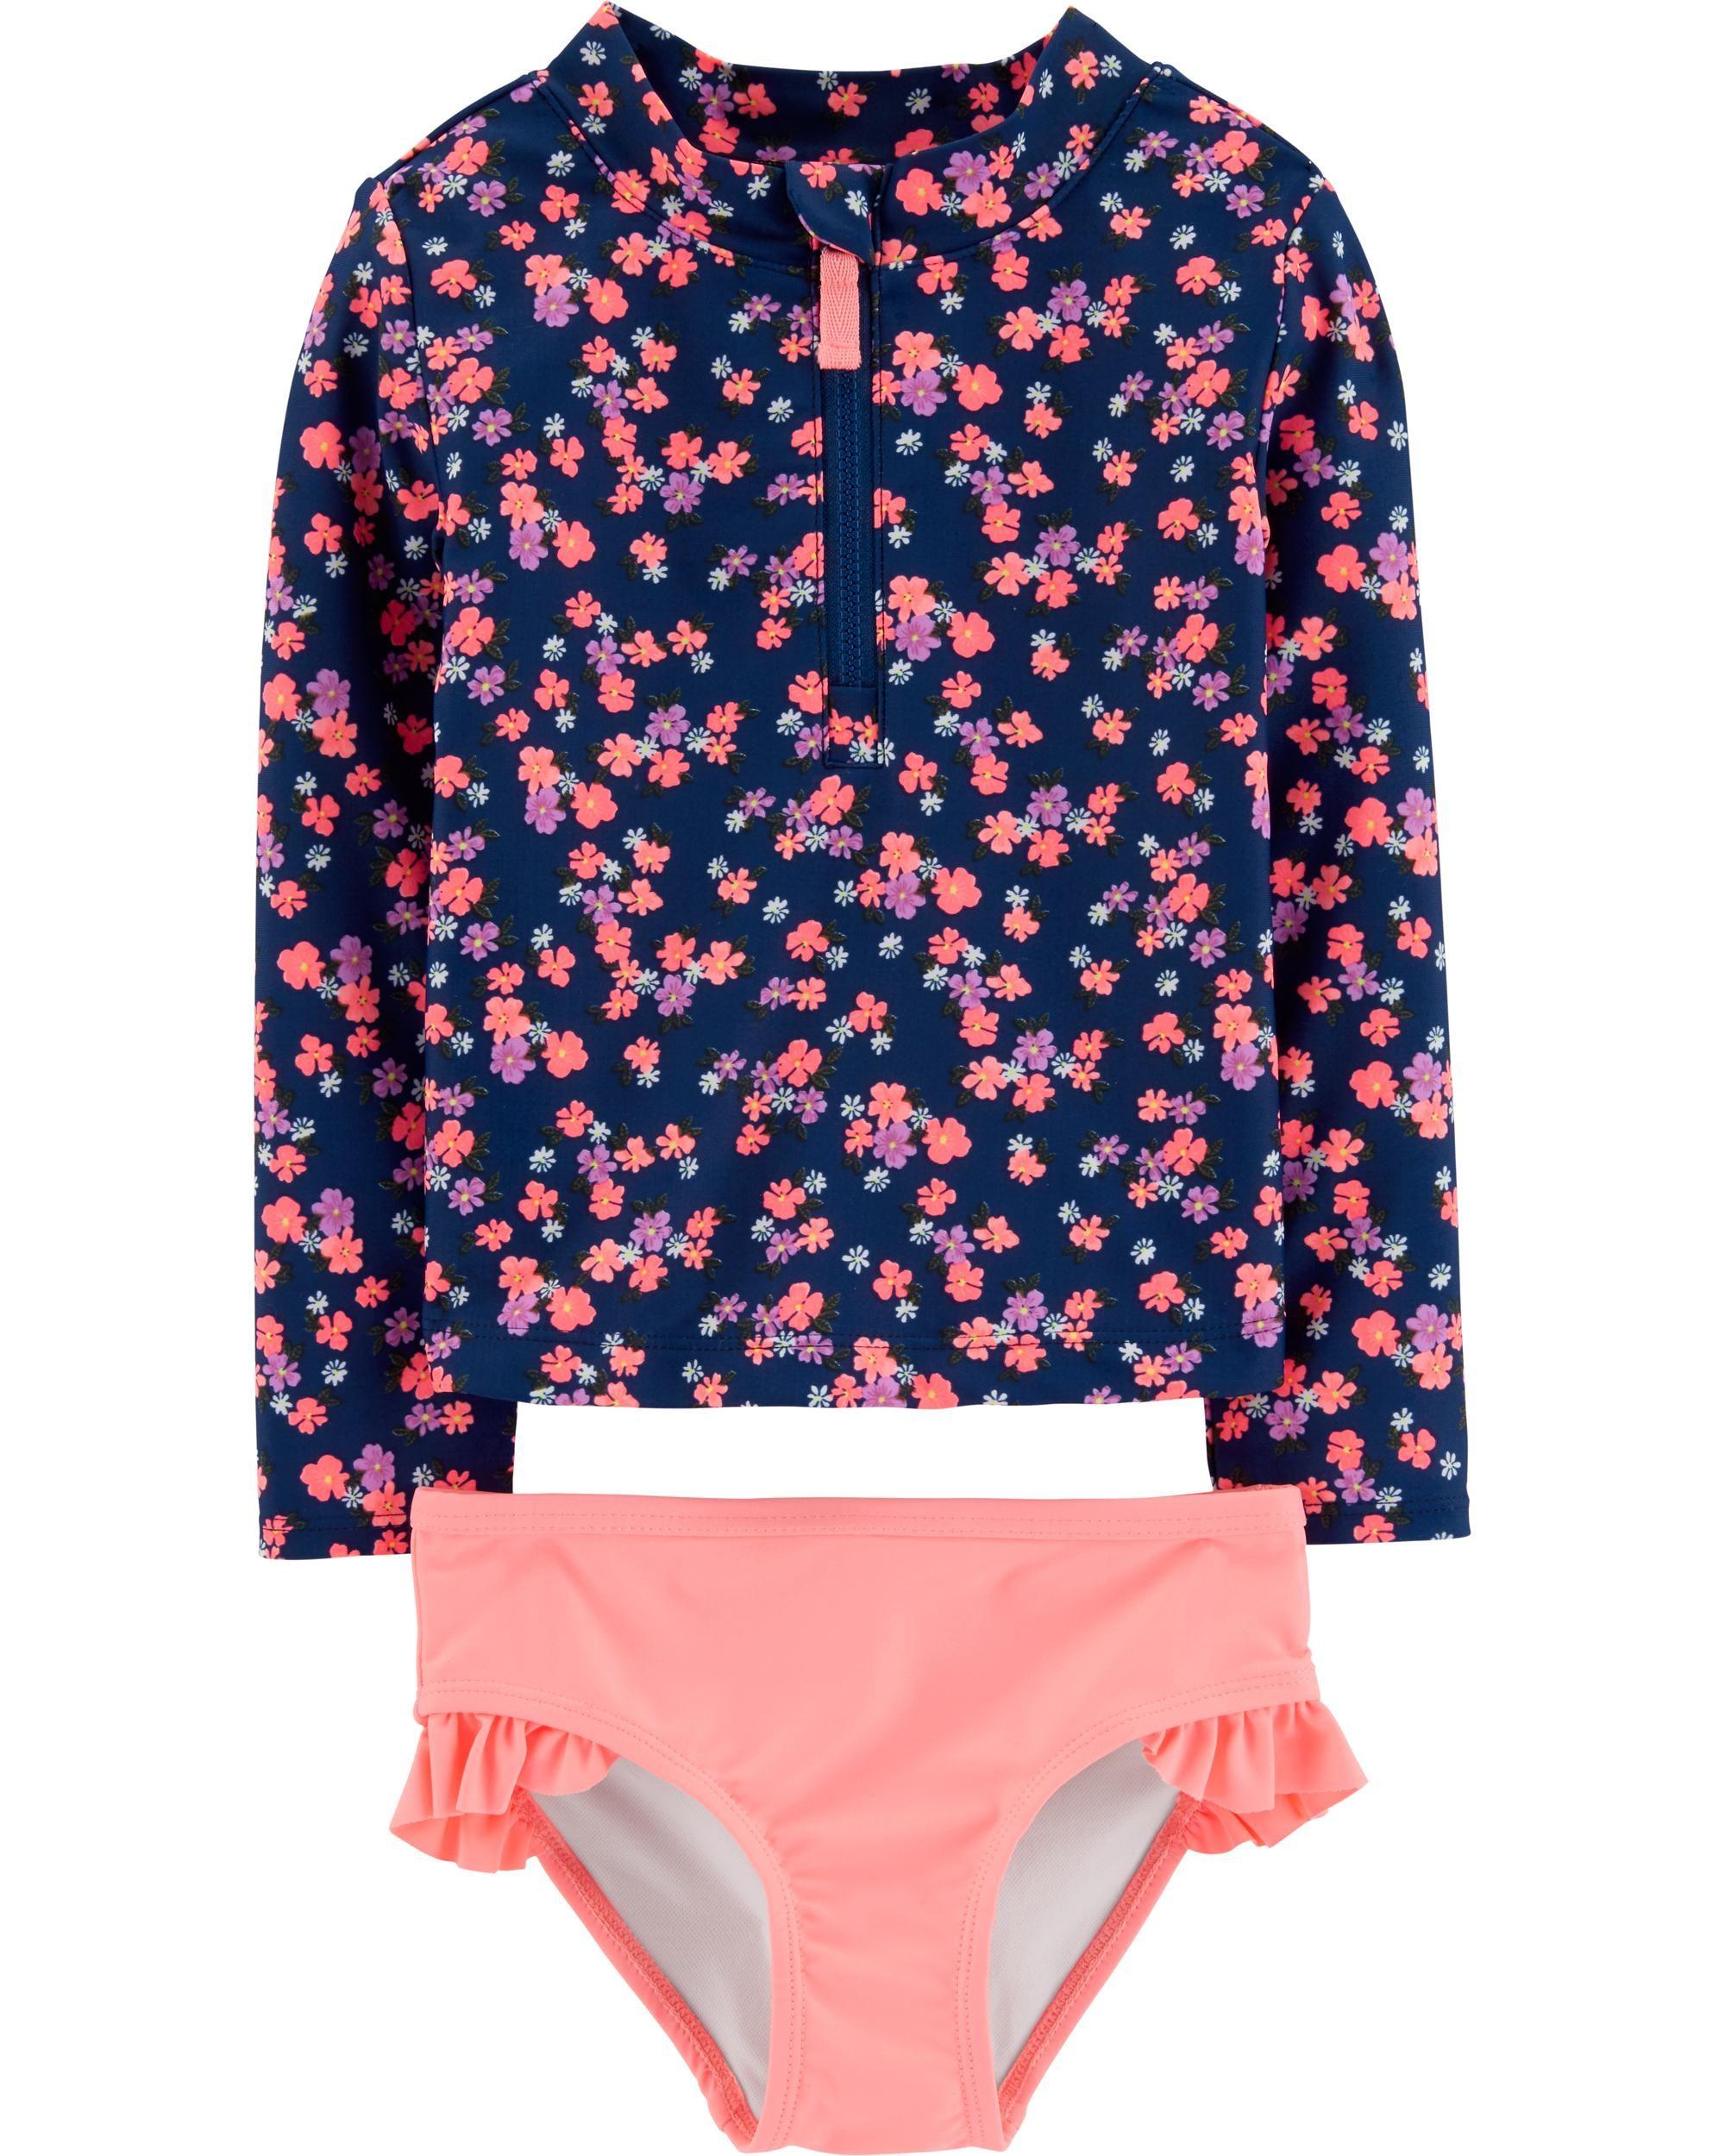 d61d3b0db5cd9 2-Piece Floral UV Swim Shirt Set